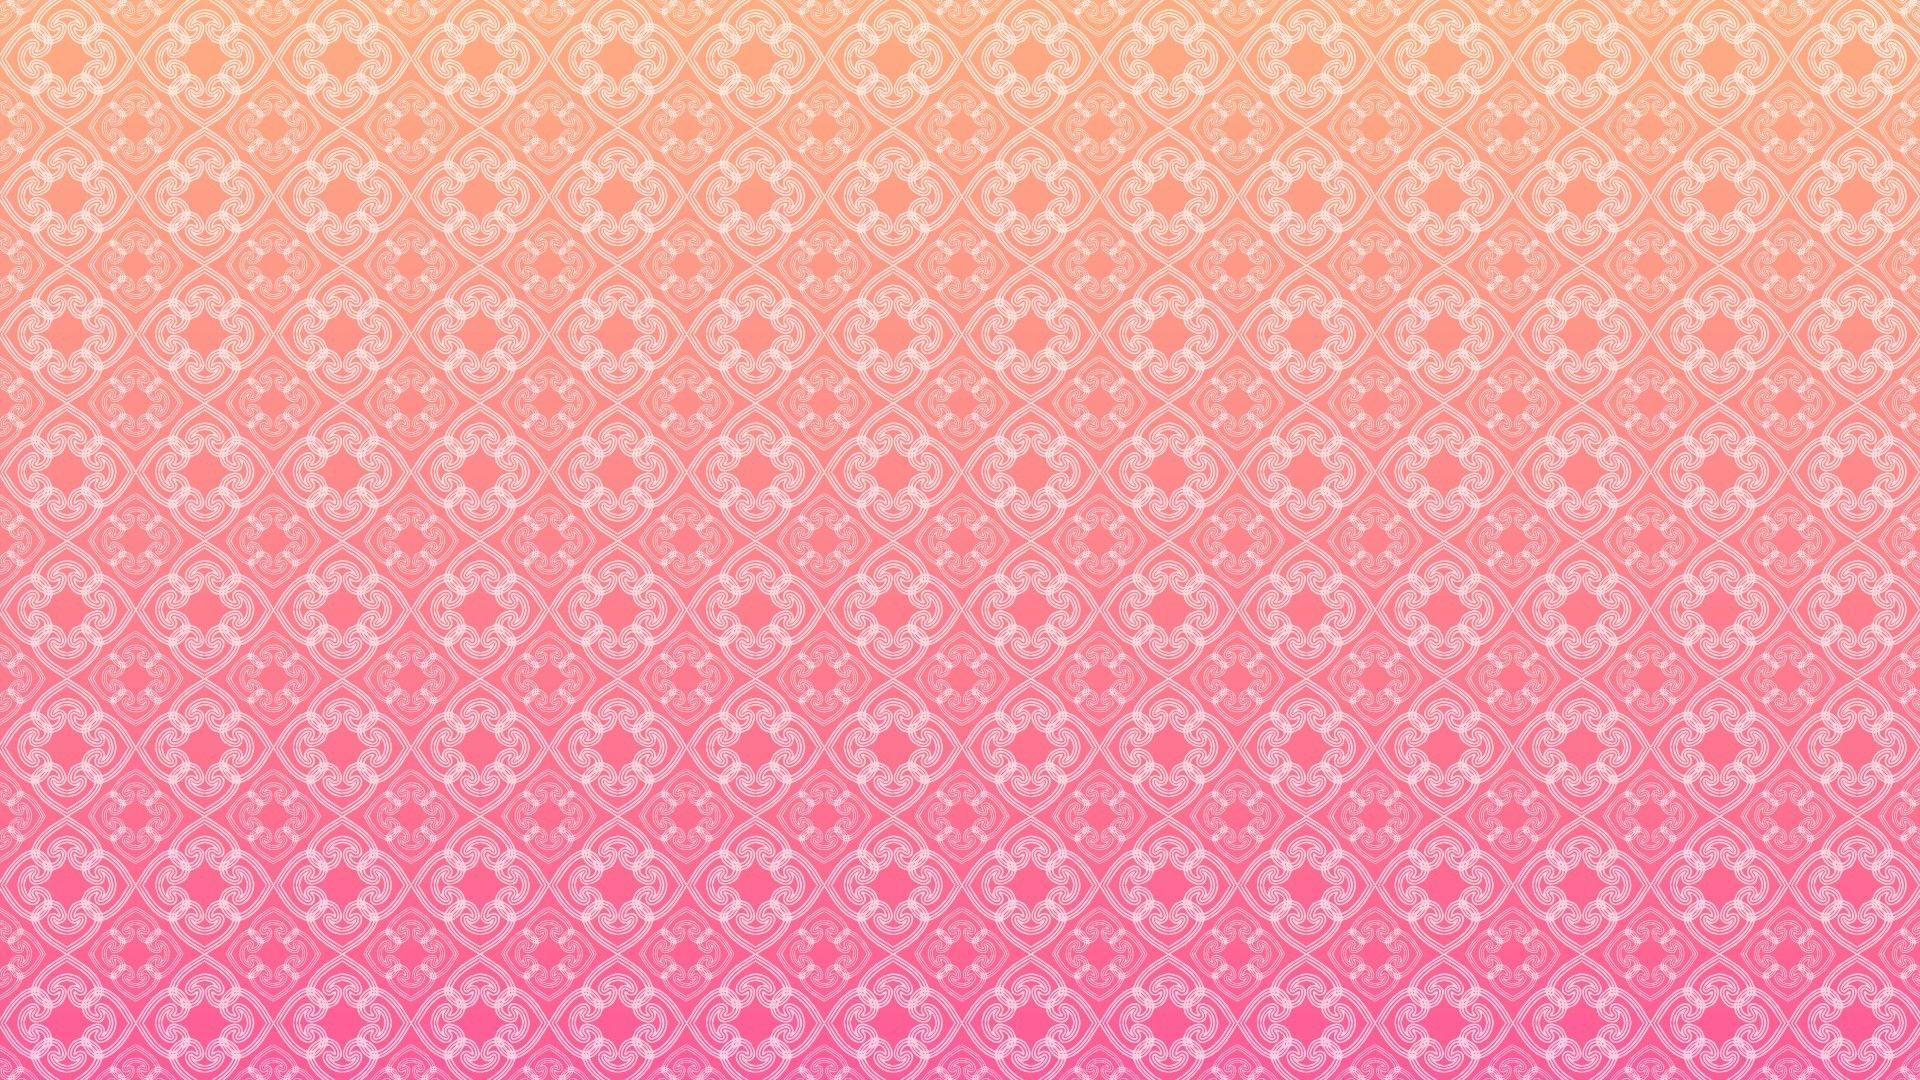 Cute Pink Wallpaper Hd Download Free 7 Pink Pattern Background Pink Wallpaper Pastel Pink Wallpaper